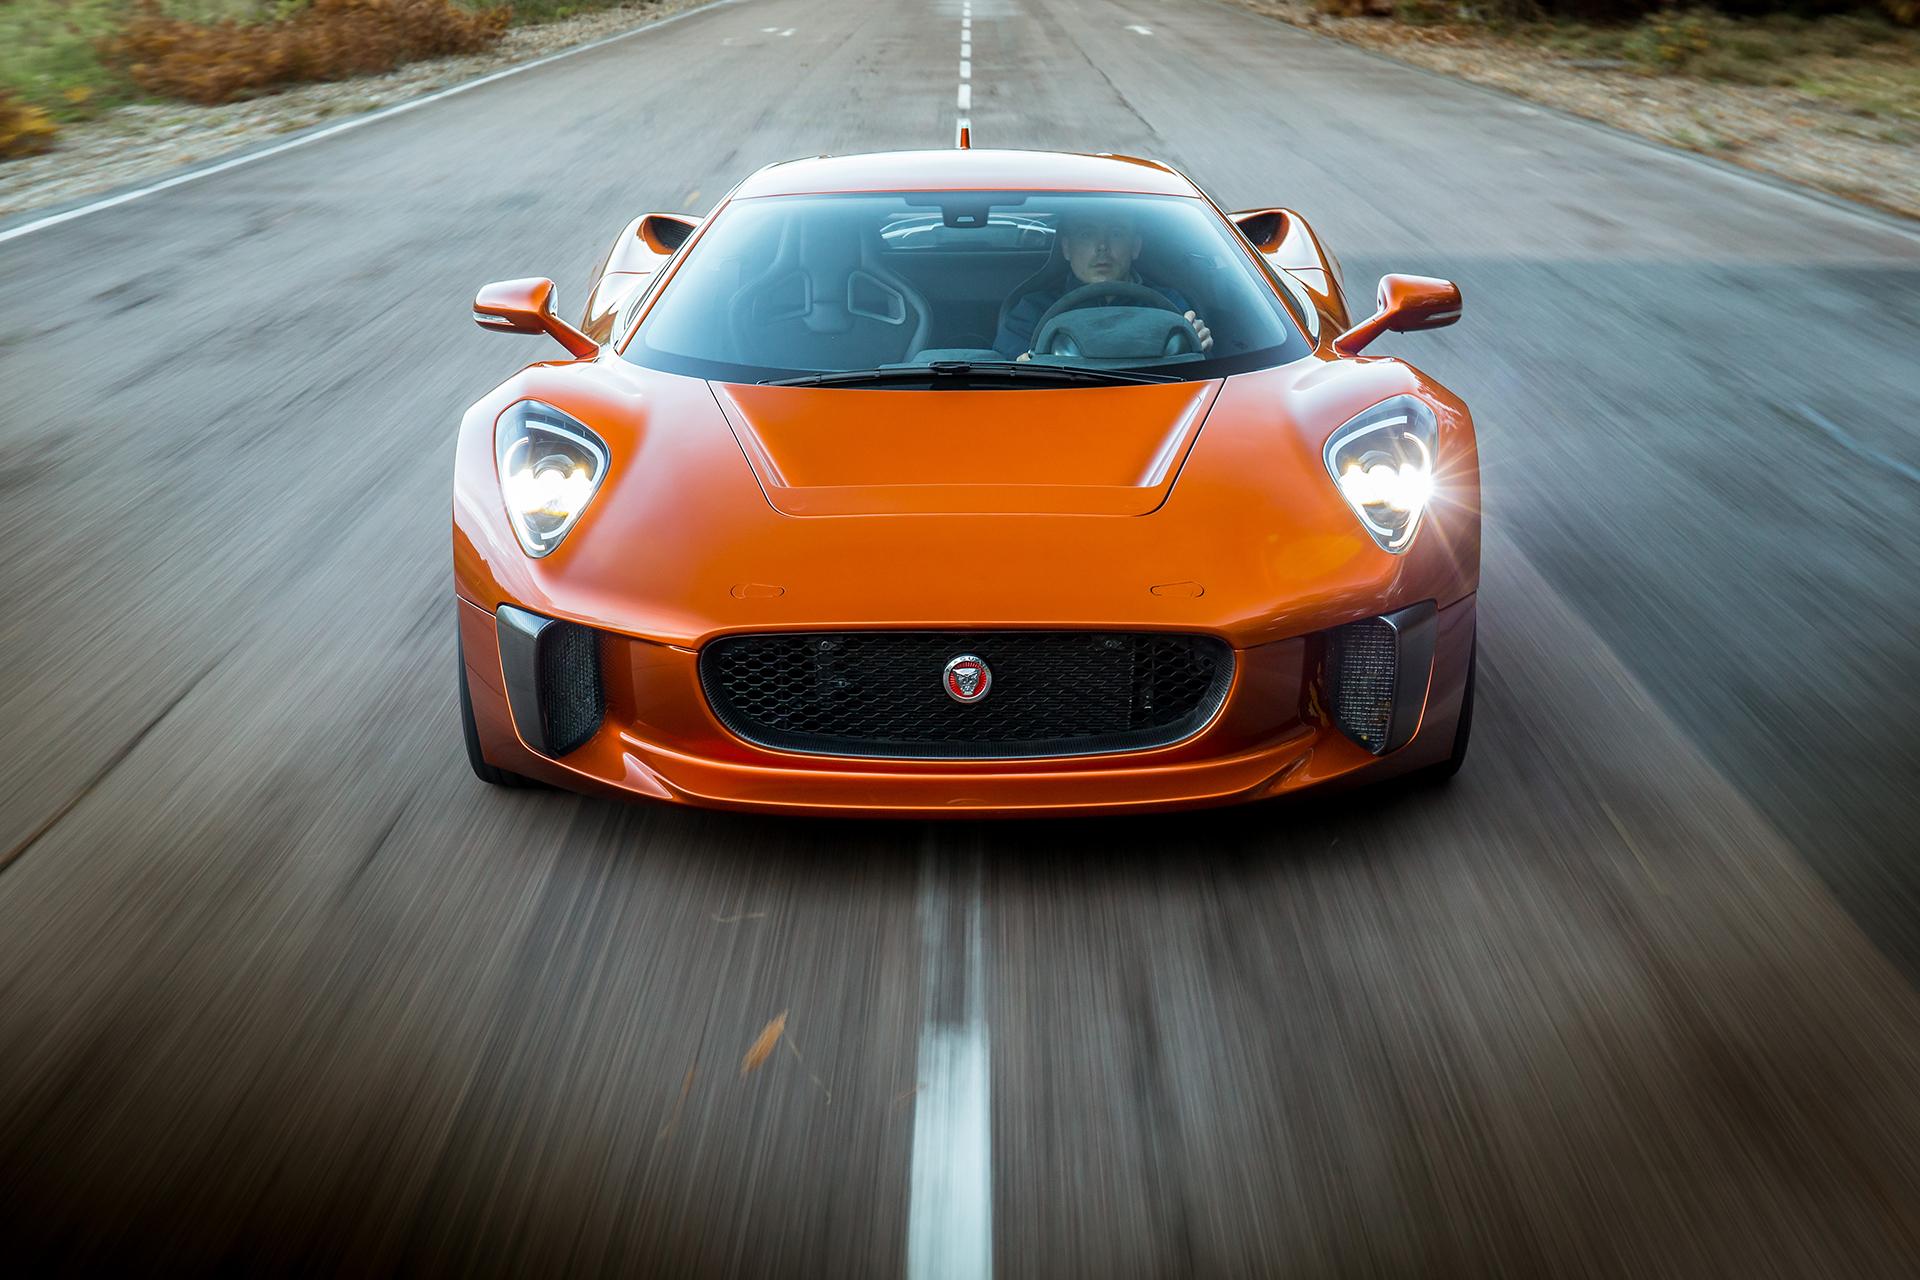 jaguar c x75 concept super car star du film 007 spectre. Black Bedroom Furniture Sets. Home Design Ideas